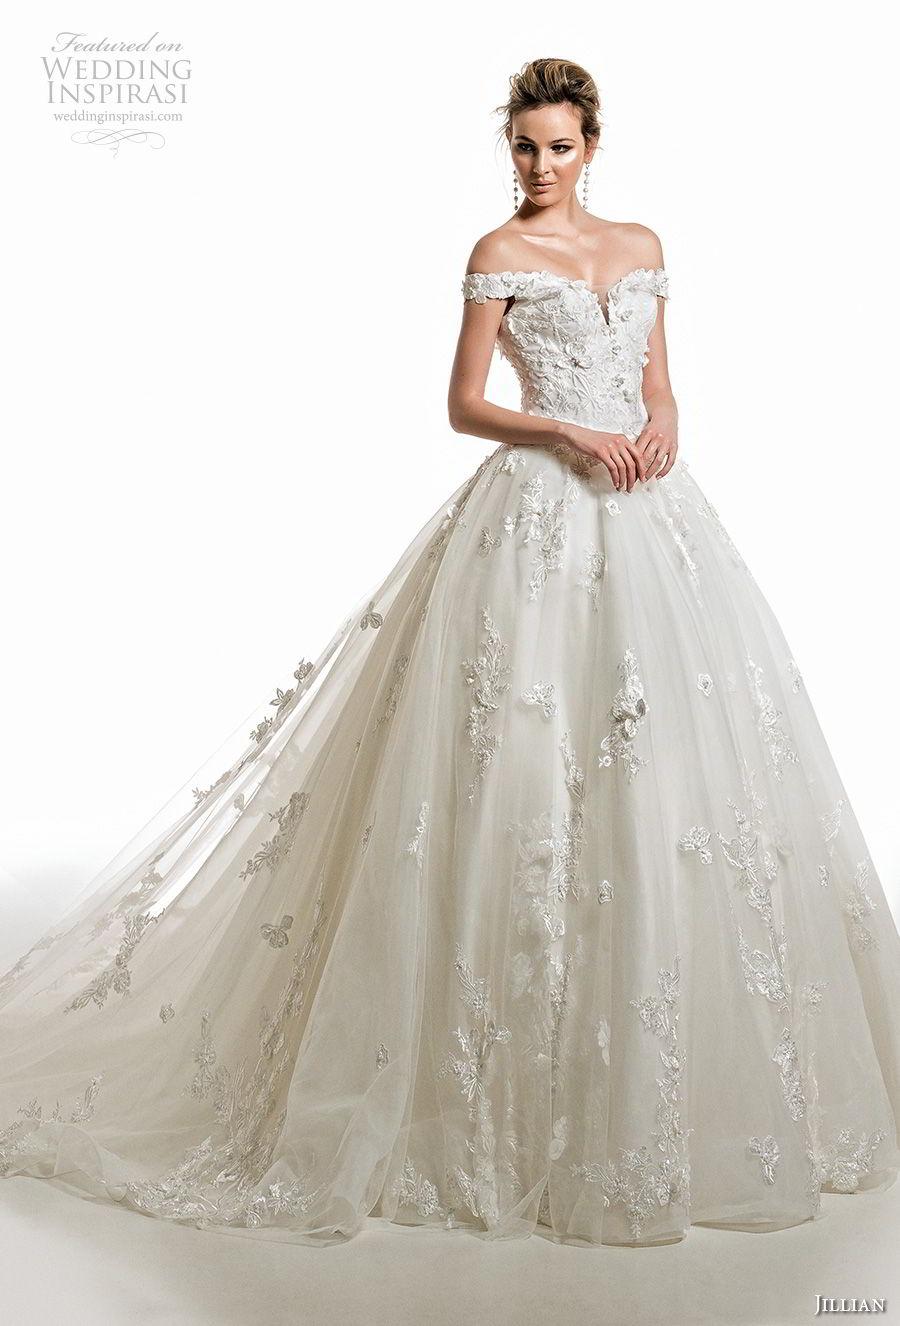 jillian 2019 bridal off the shoulder sweetheart neckline heavily embellished bodice princess romantic ball gown wedding dress royal train (2) mv